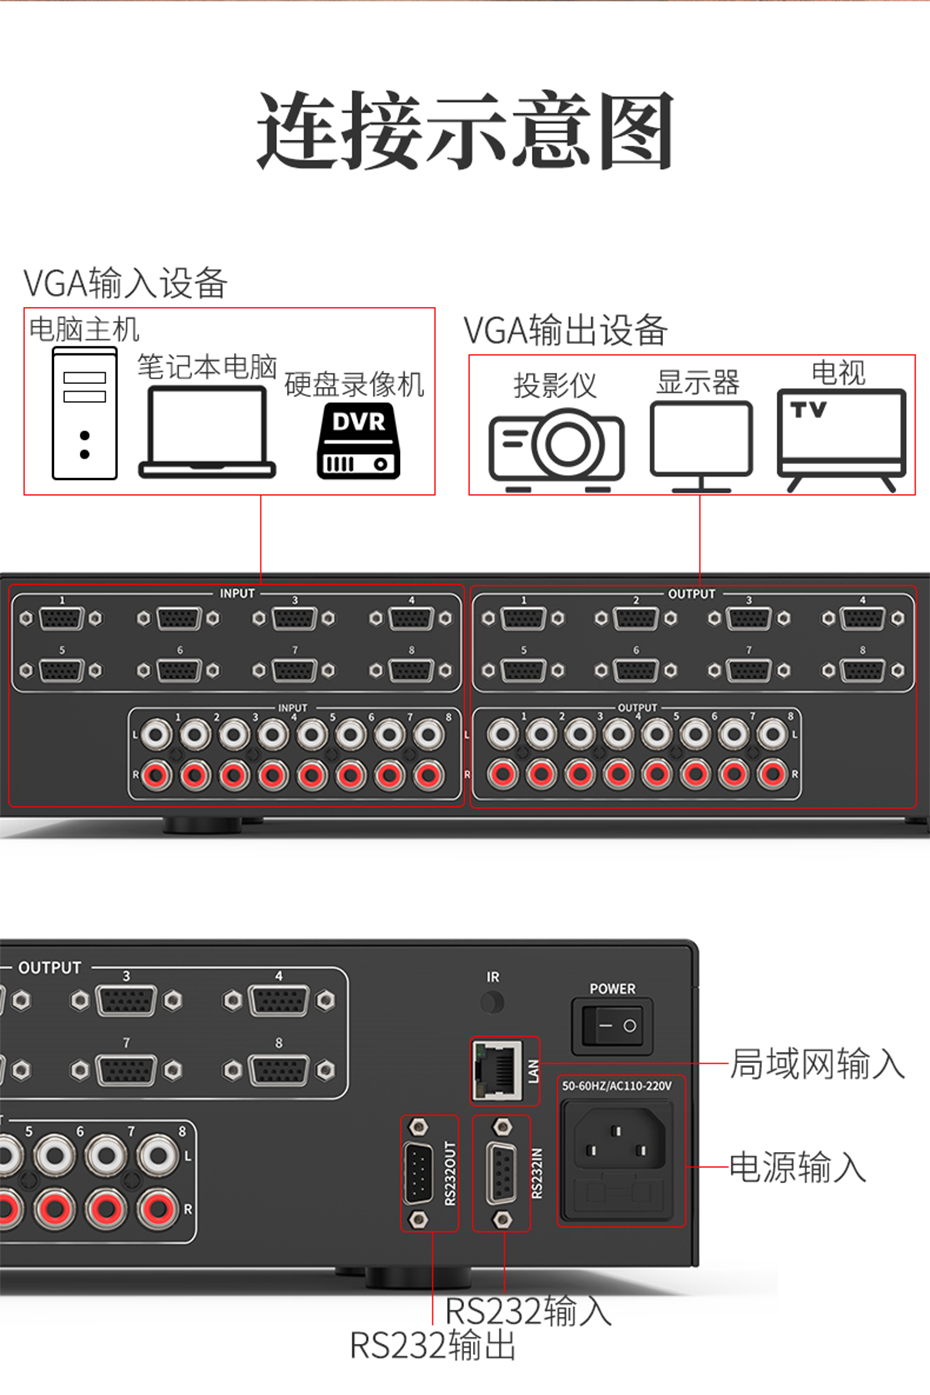 VGA矩阵拼接屏控制器8进8出V818A连接使用示意图